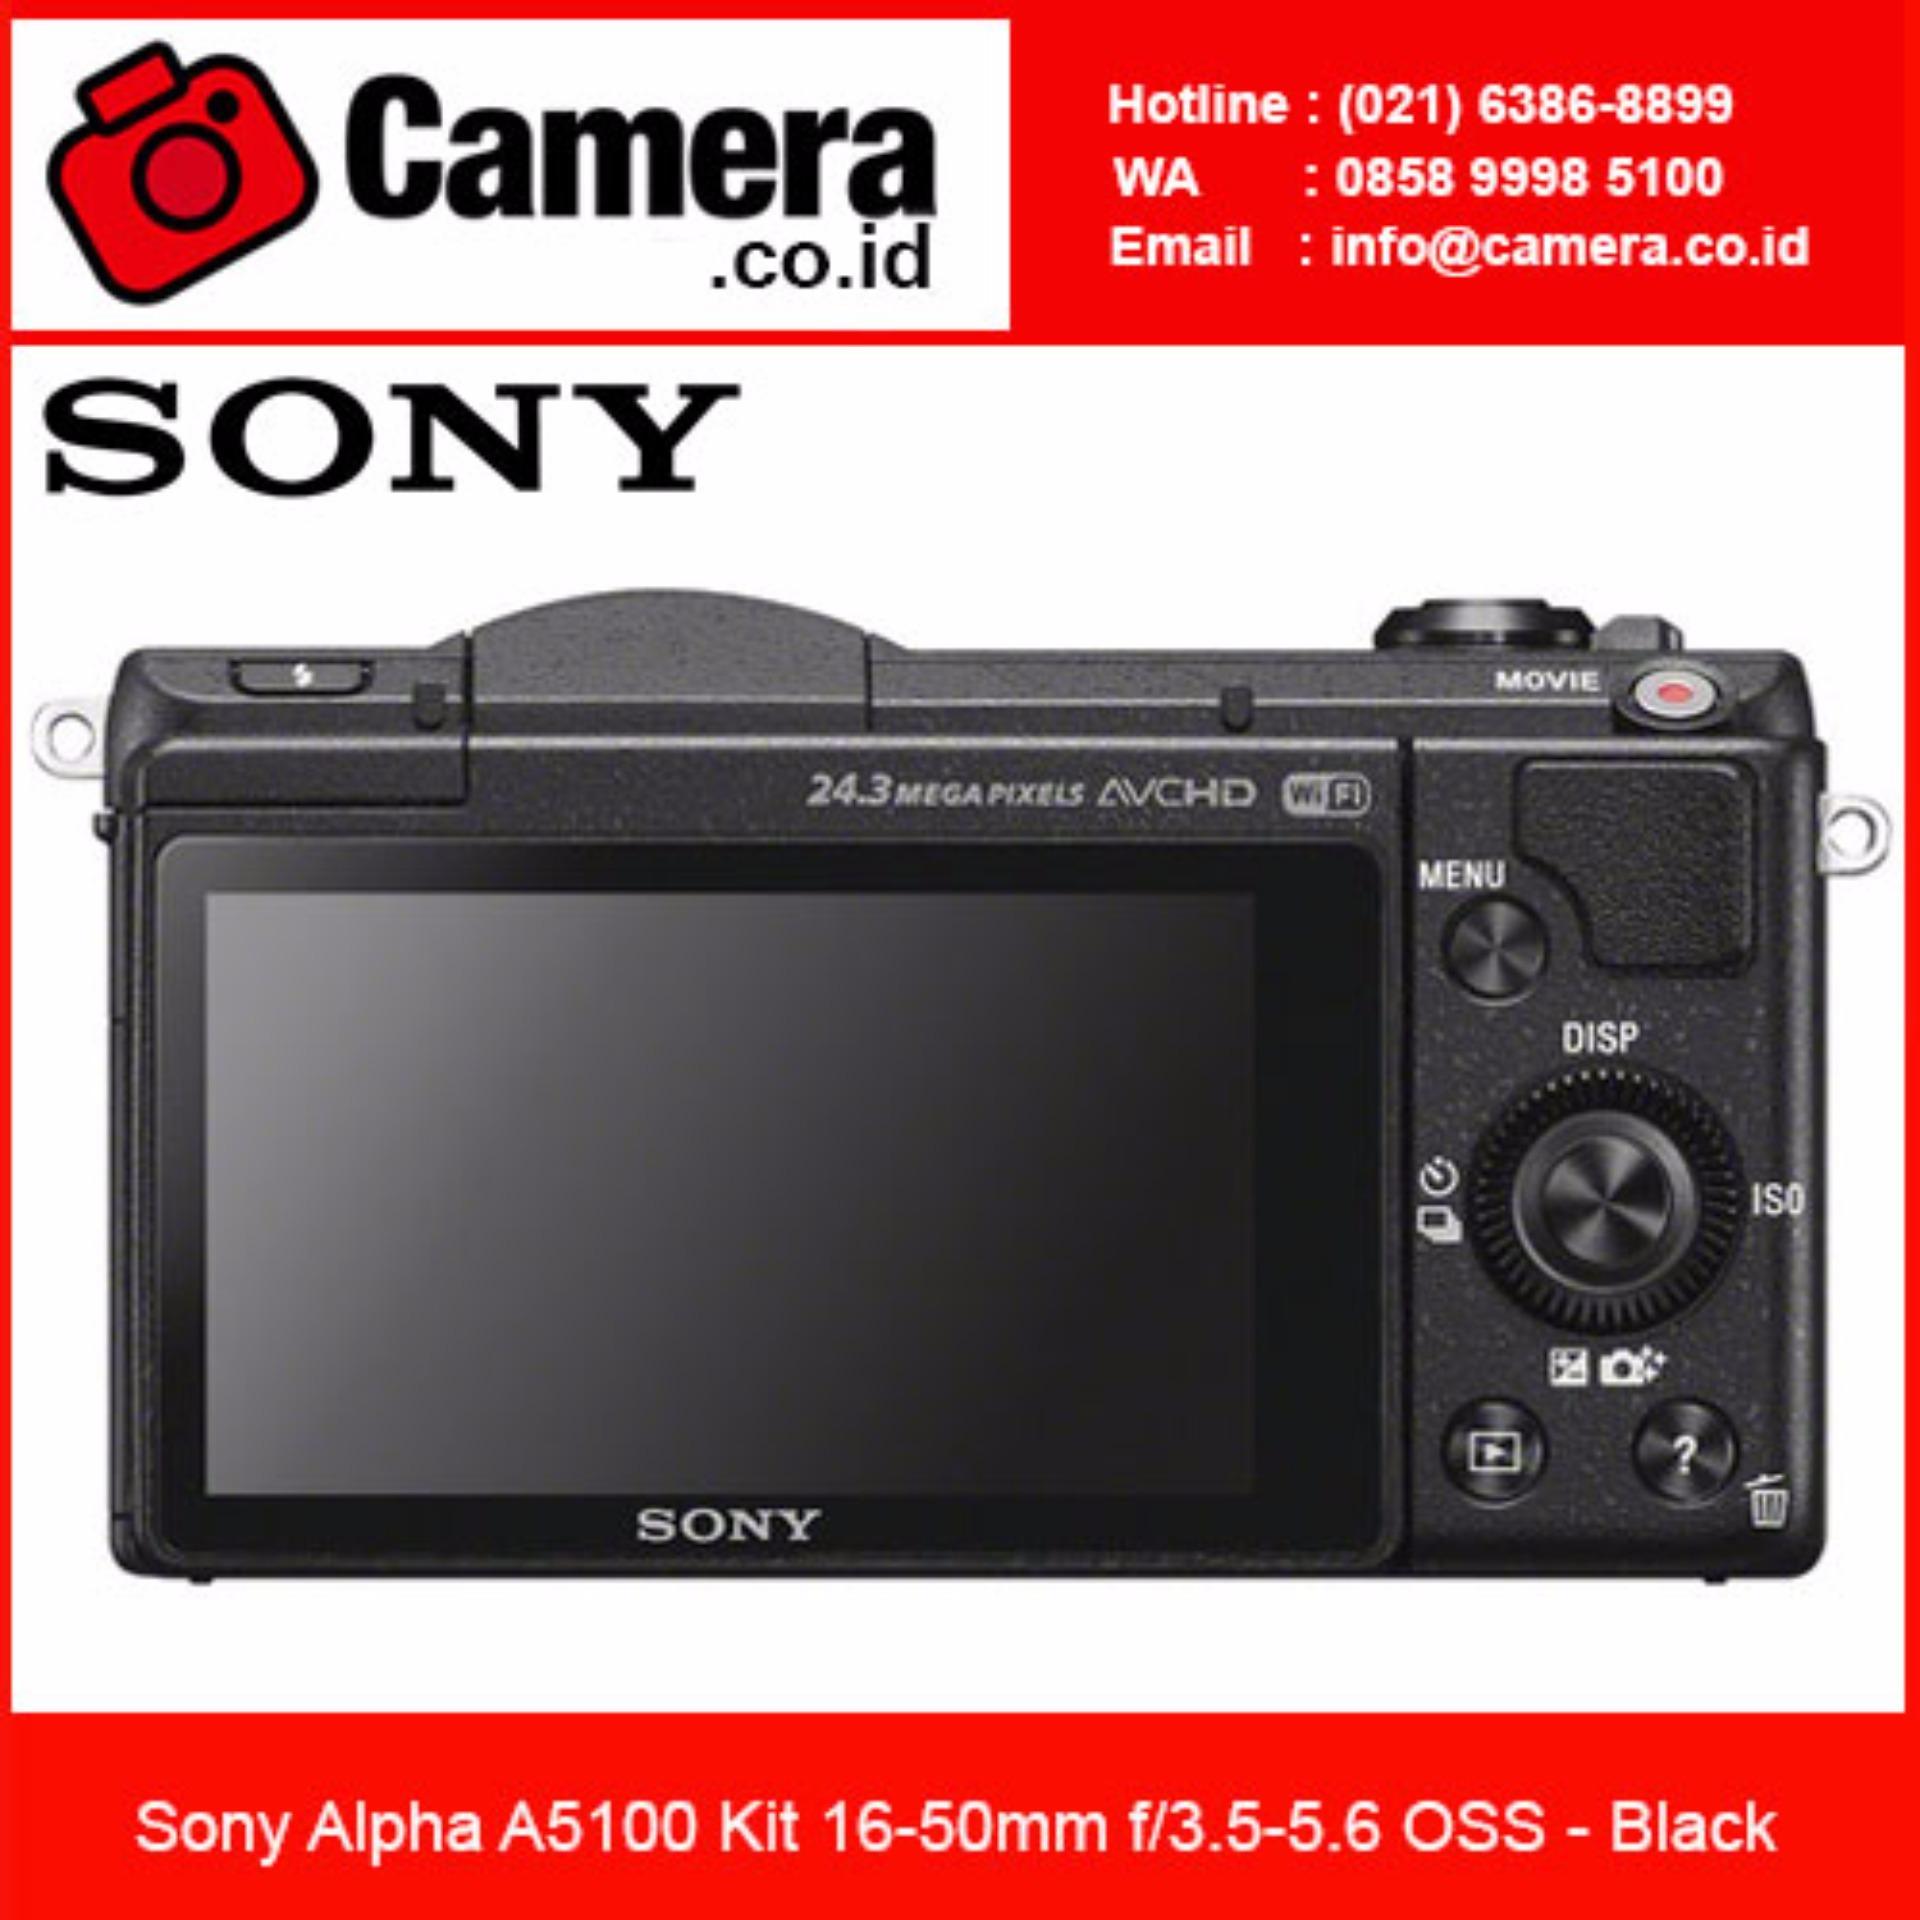 Harga Penawaran Sony Alpha A5100 Kit 16 50mm Black Free 8gb Kamera Mirrorless